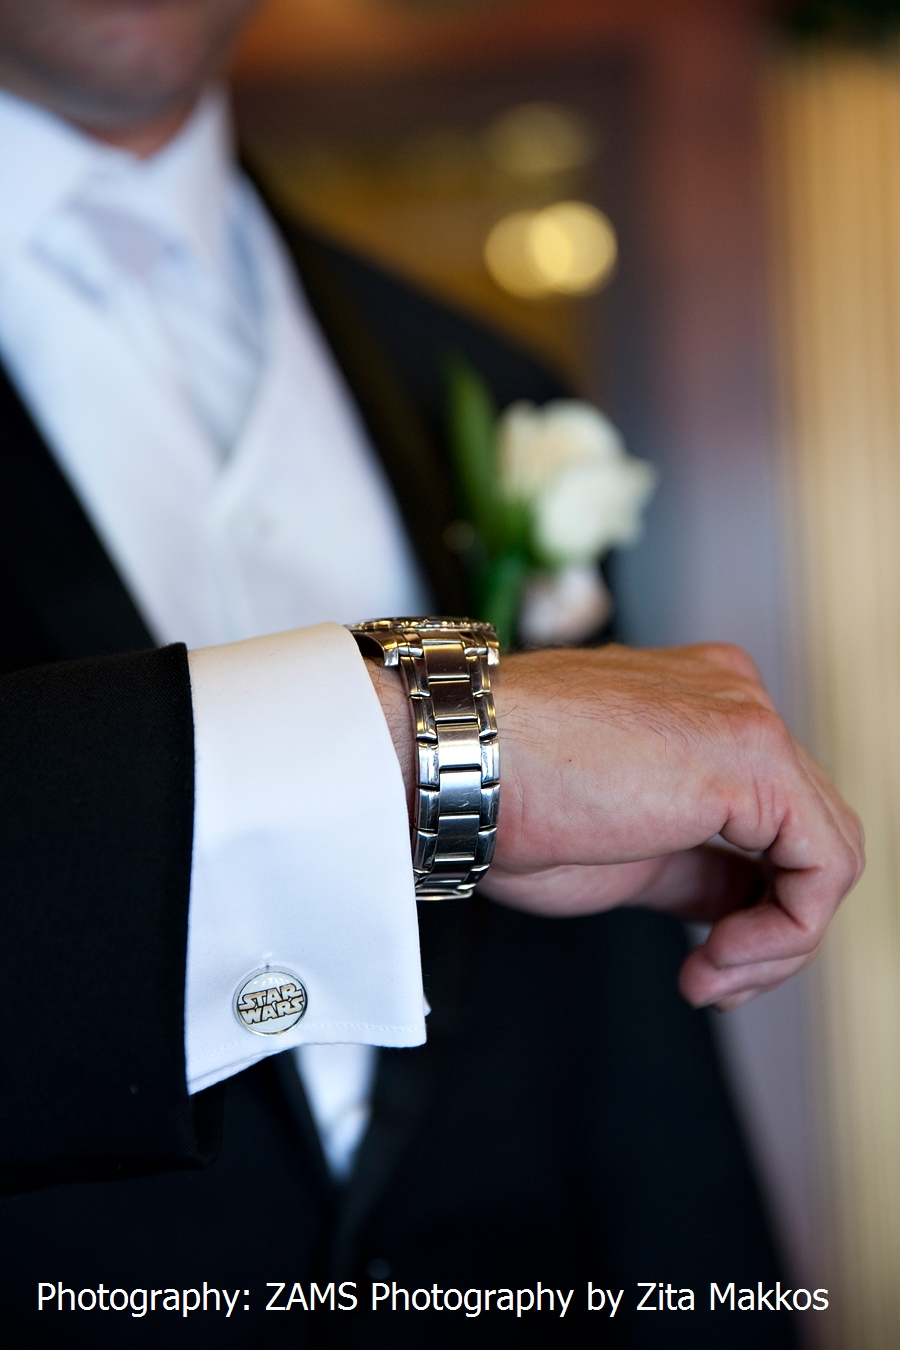 dead_pool_logo_2_cuff_links_men_wedding_groomsmen_gift_cufflinks_2.jpg